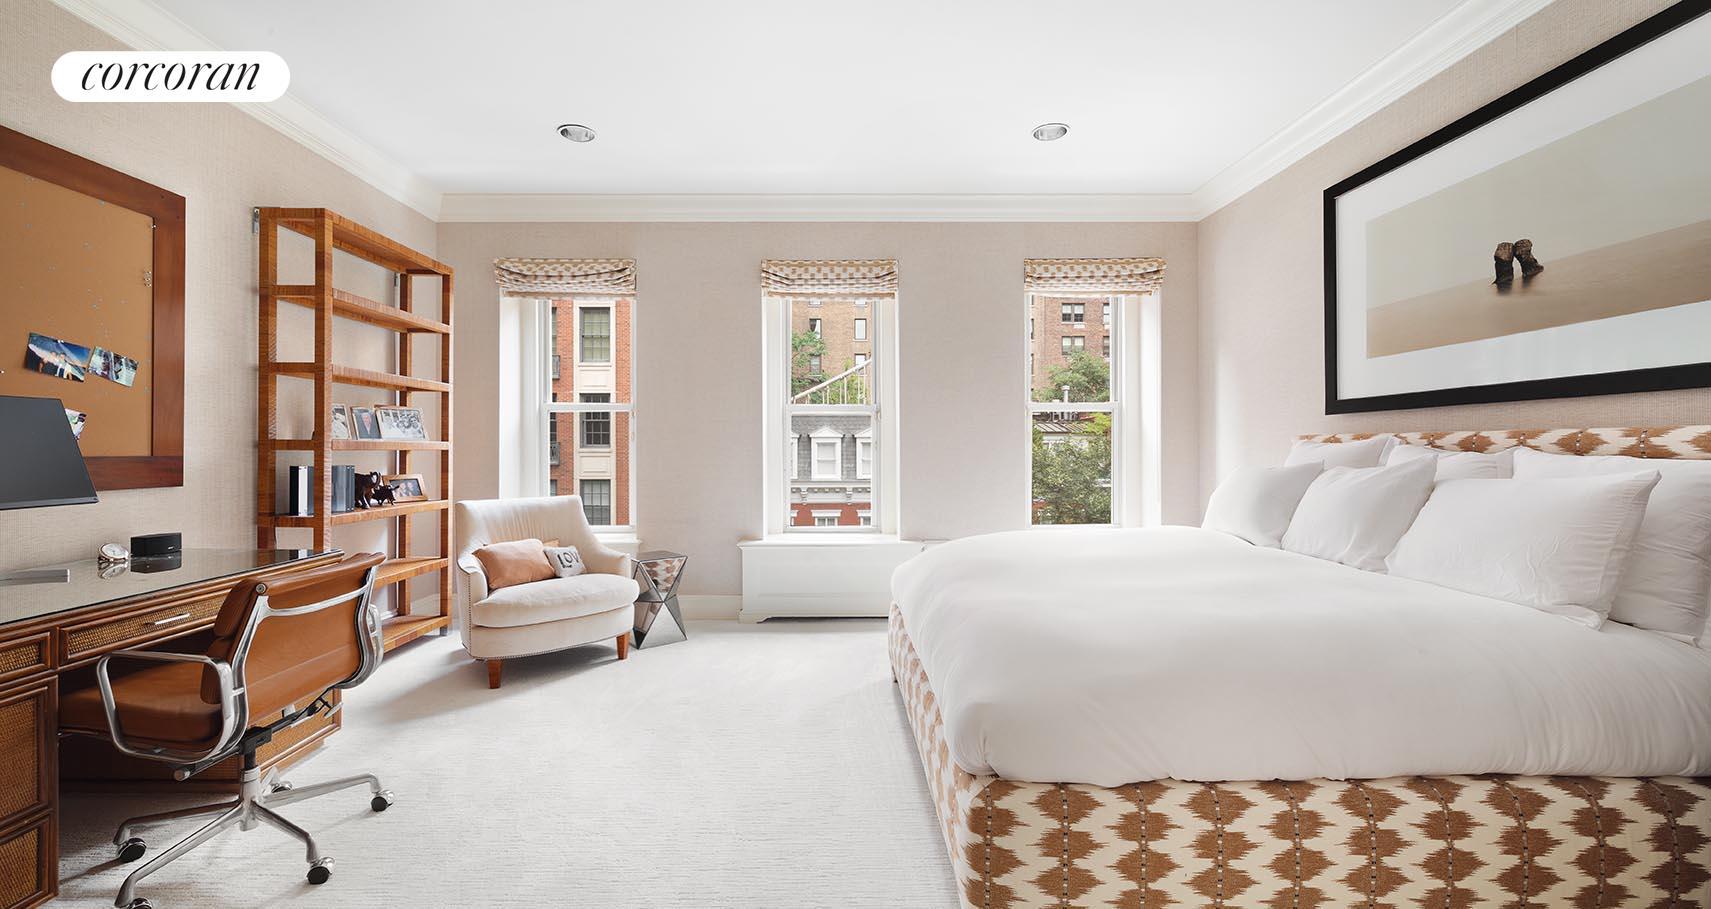 156 East 78th Street Upper East Side New York NY 10075